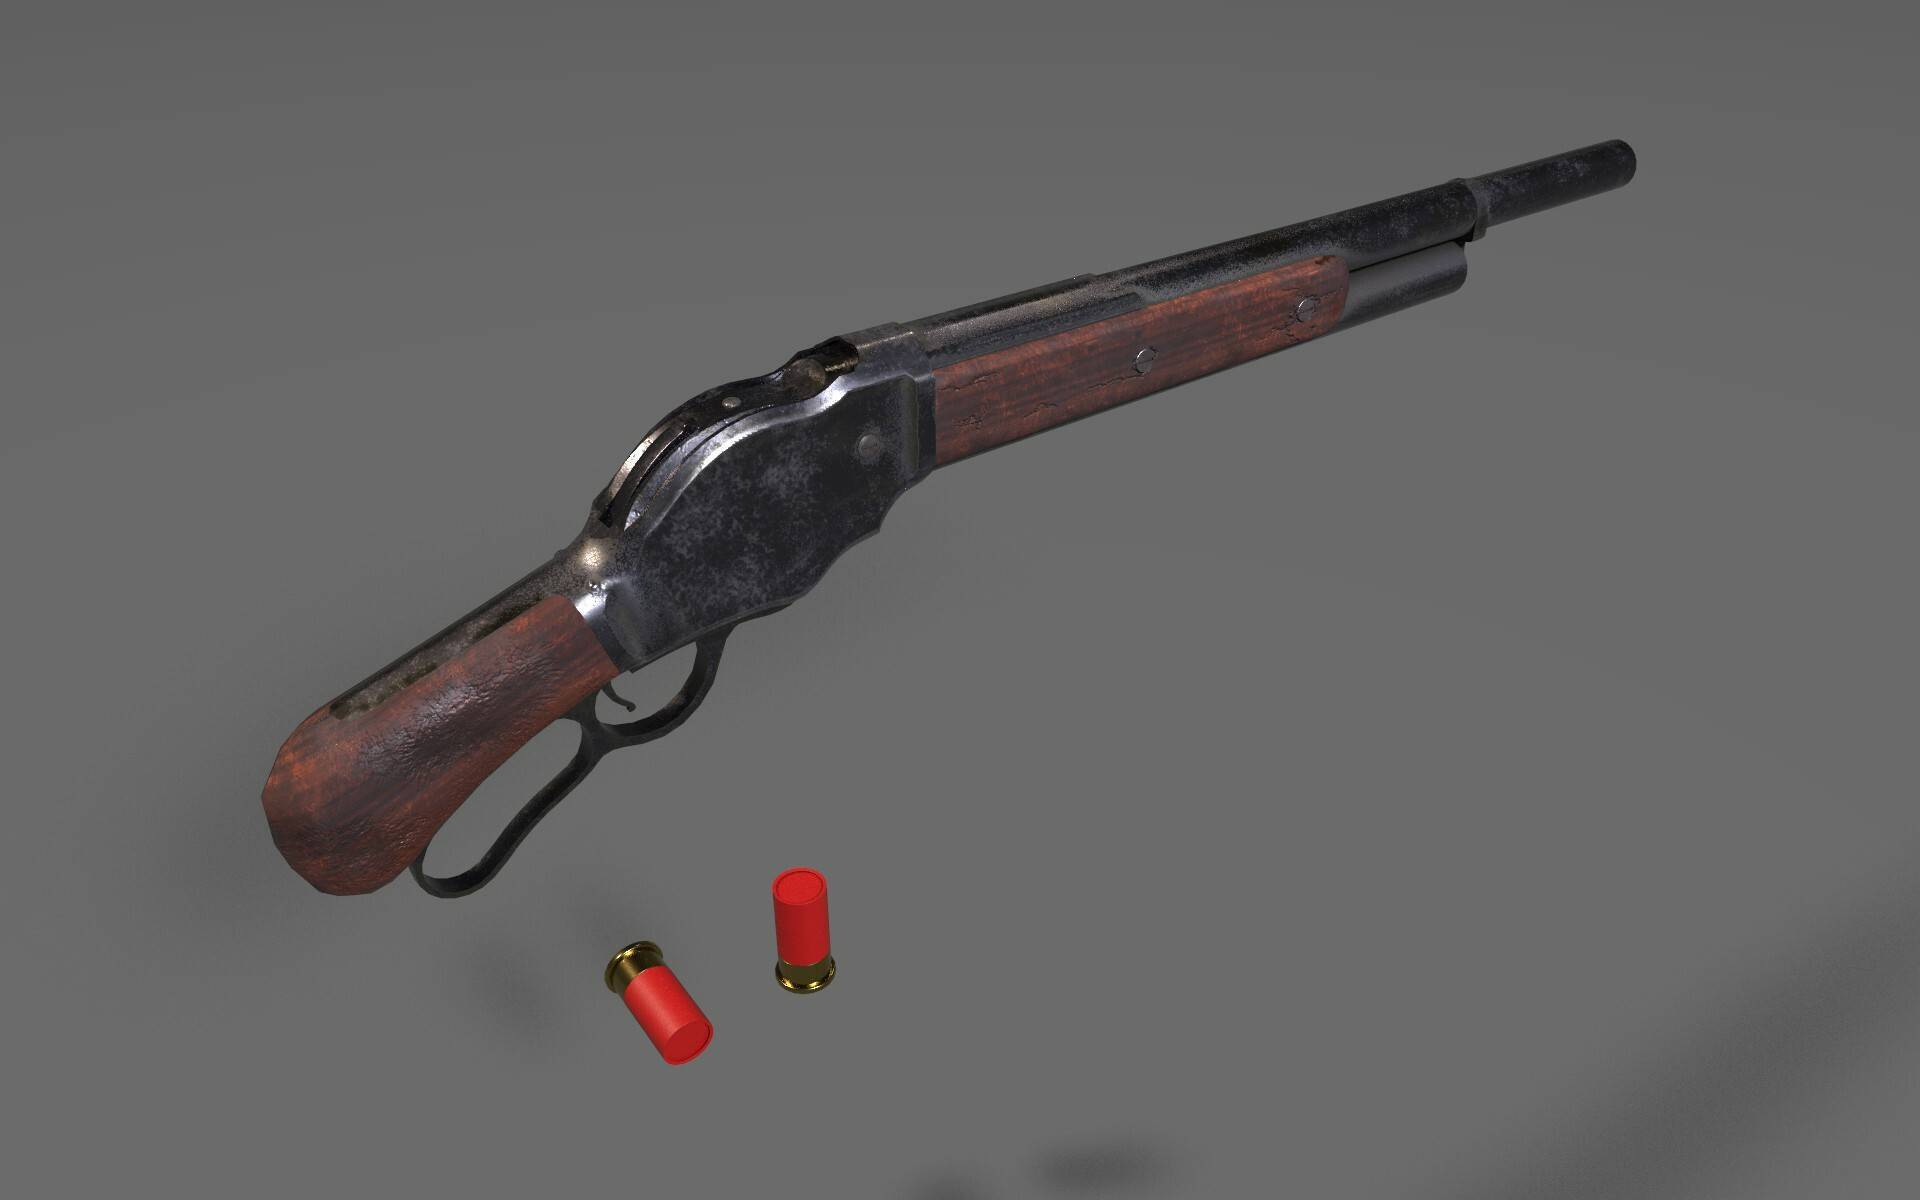 Winchester model 1887/1901 - winchester model 1887/1901